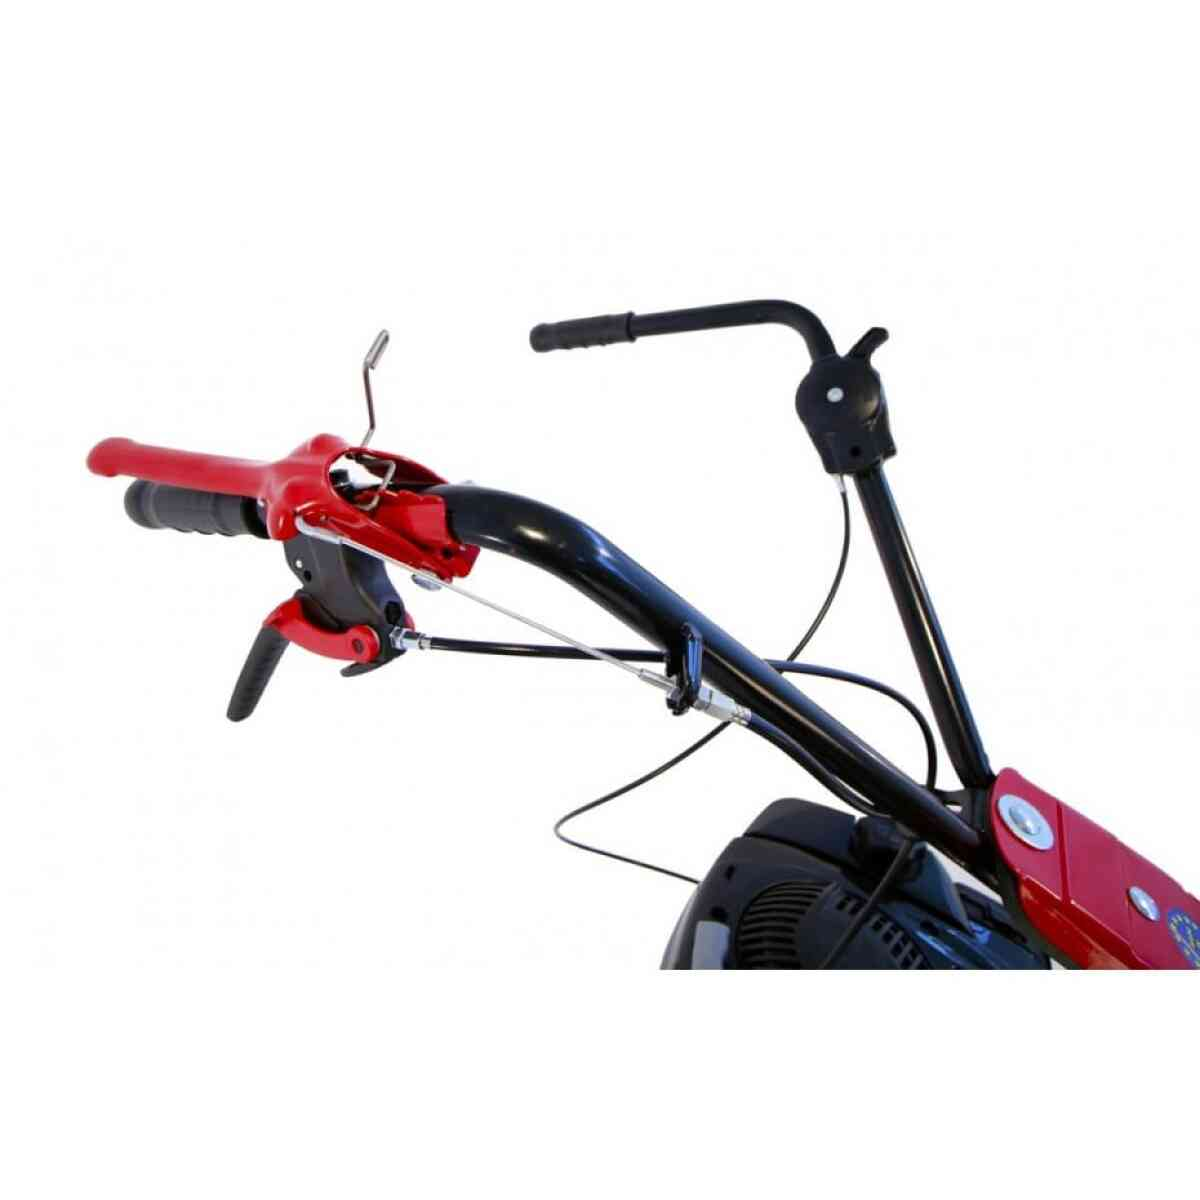 motocositoare rotativa o mac m150 bs 625 exi series 57cm padure gardina.ro 61